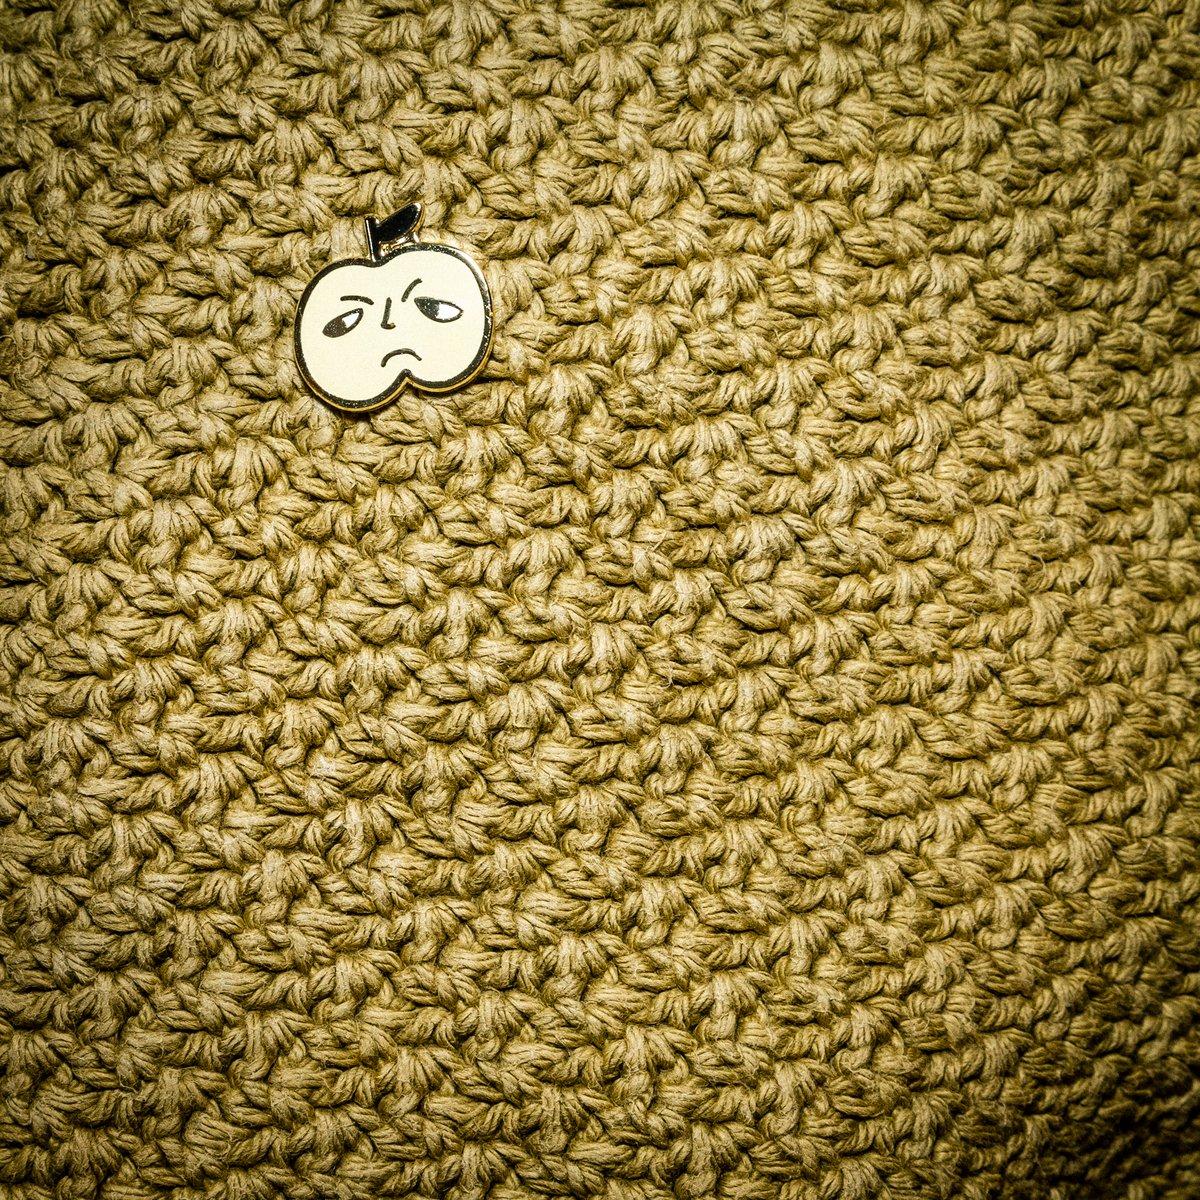 Image of Grumpy Apple Enamel Pin